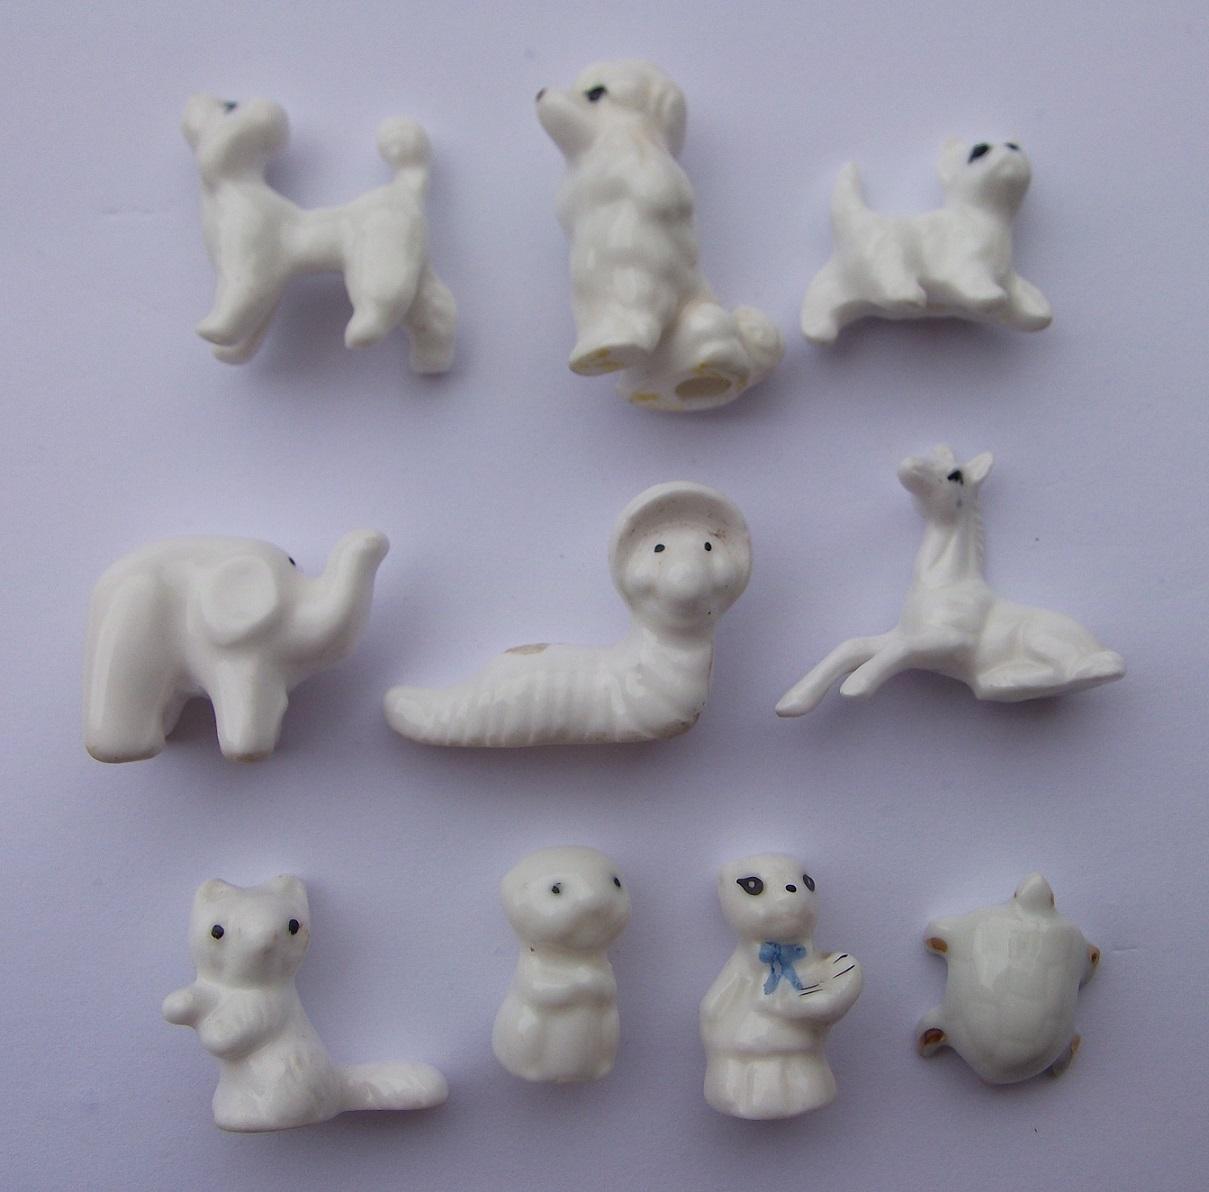 Animaux blancs5